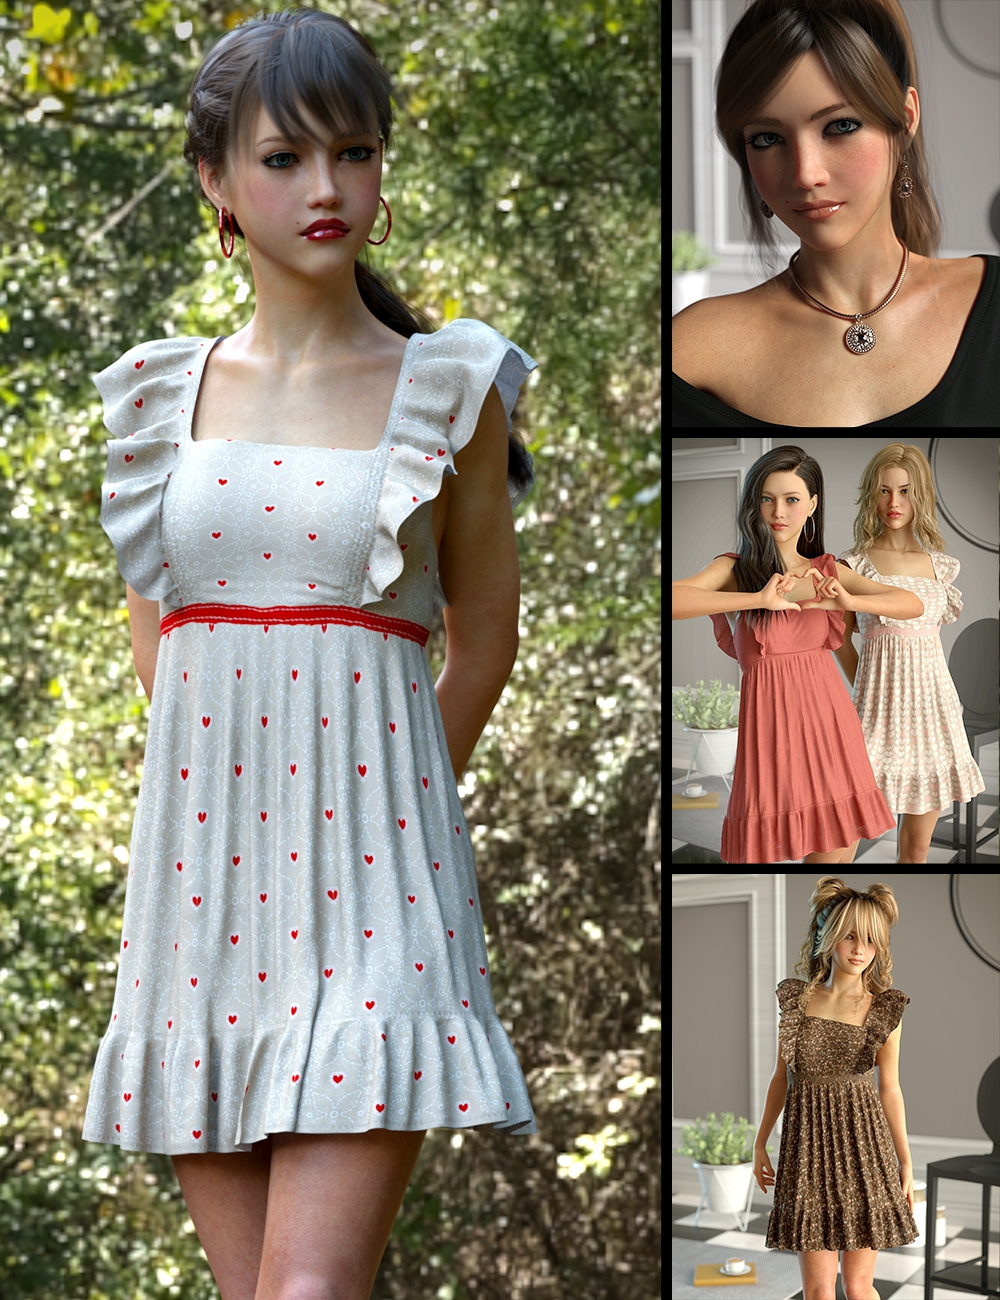 Christabel and the Sincerity Dress Bundle by: Lyoness, 3D Models by Daz 3D